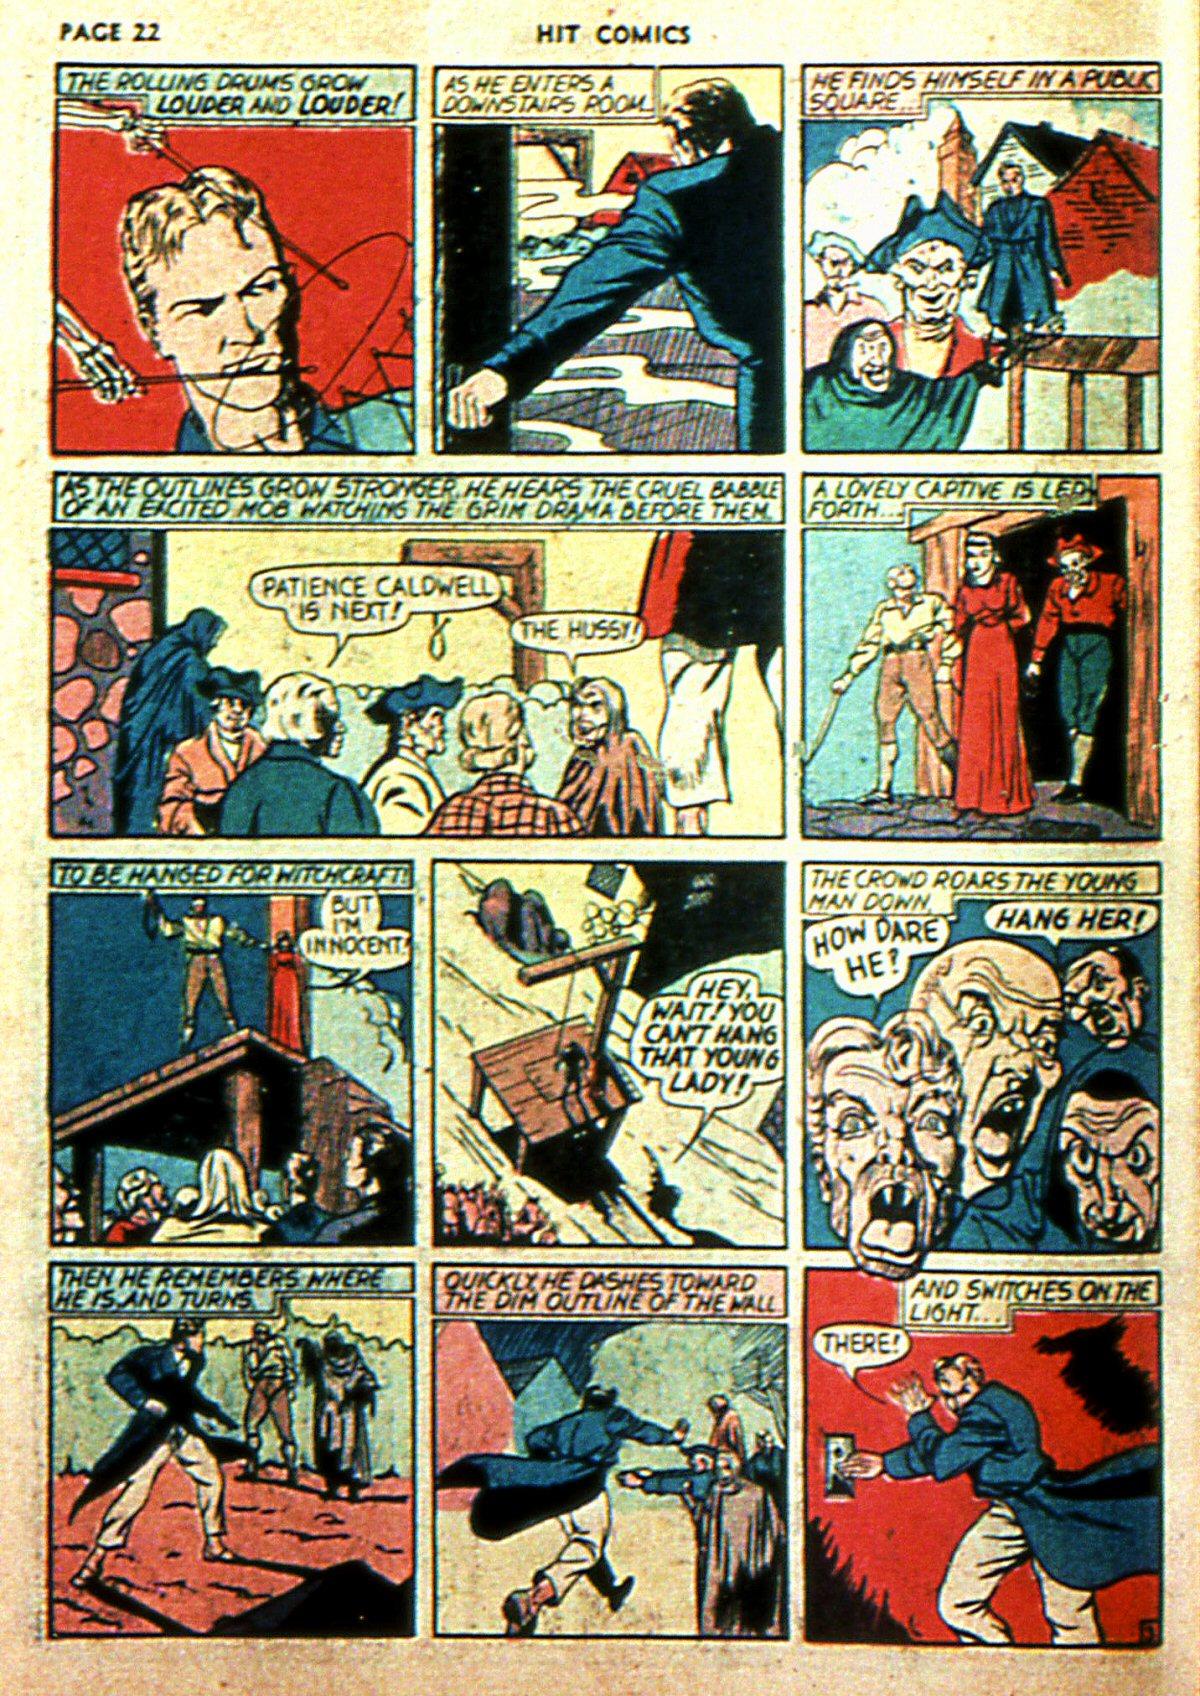 Read online Hit Comics comic -  Issue #2 - 24